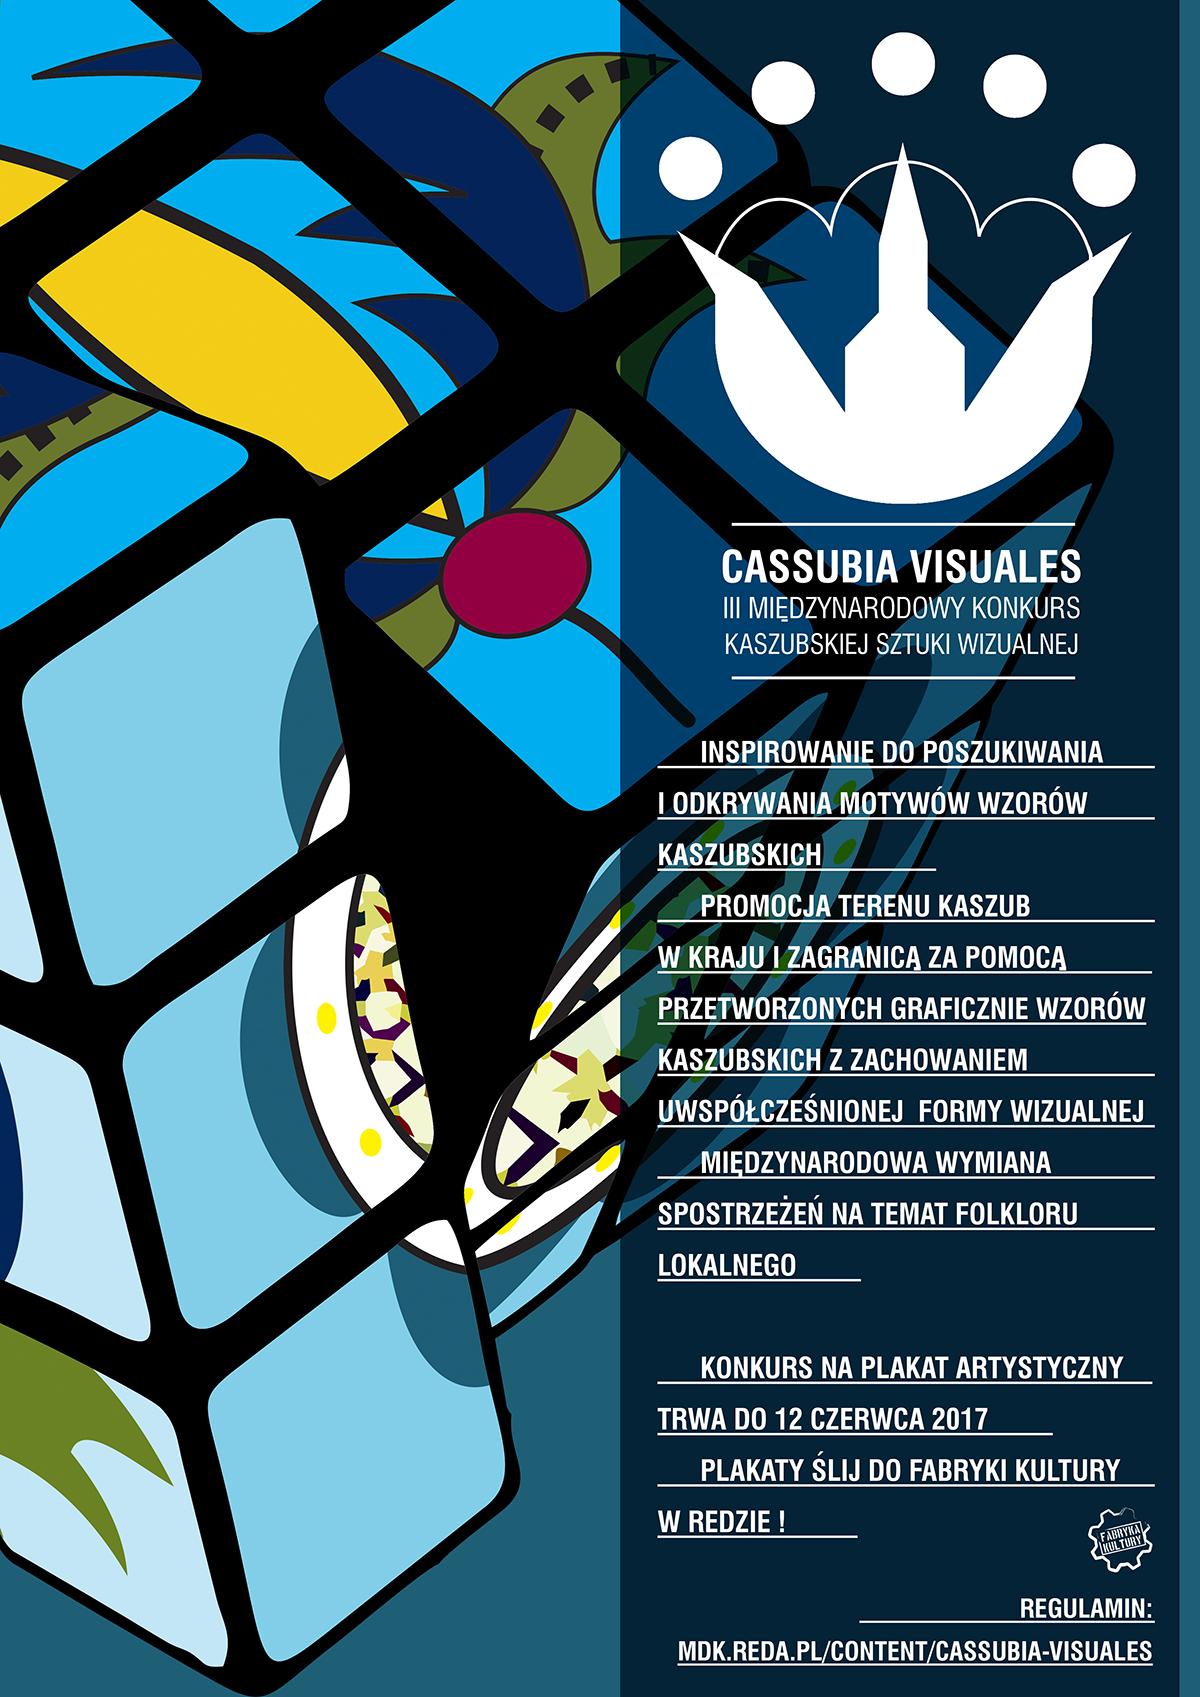 Cassubia Visuales (źródło: materiały prasowe organizatora)